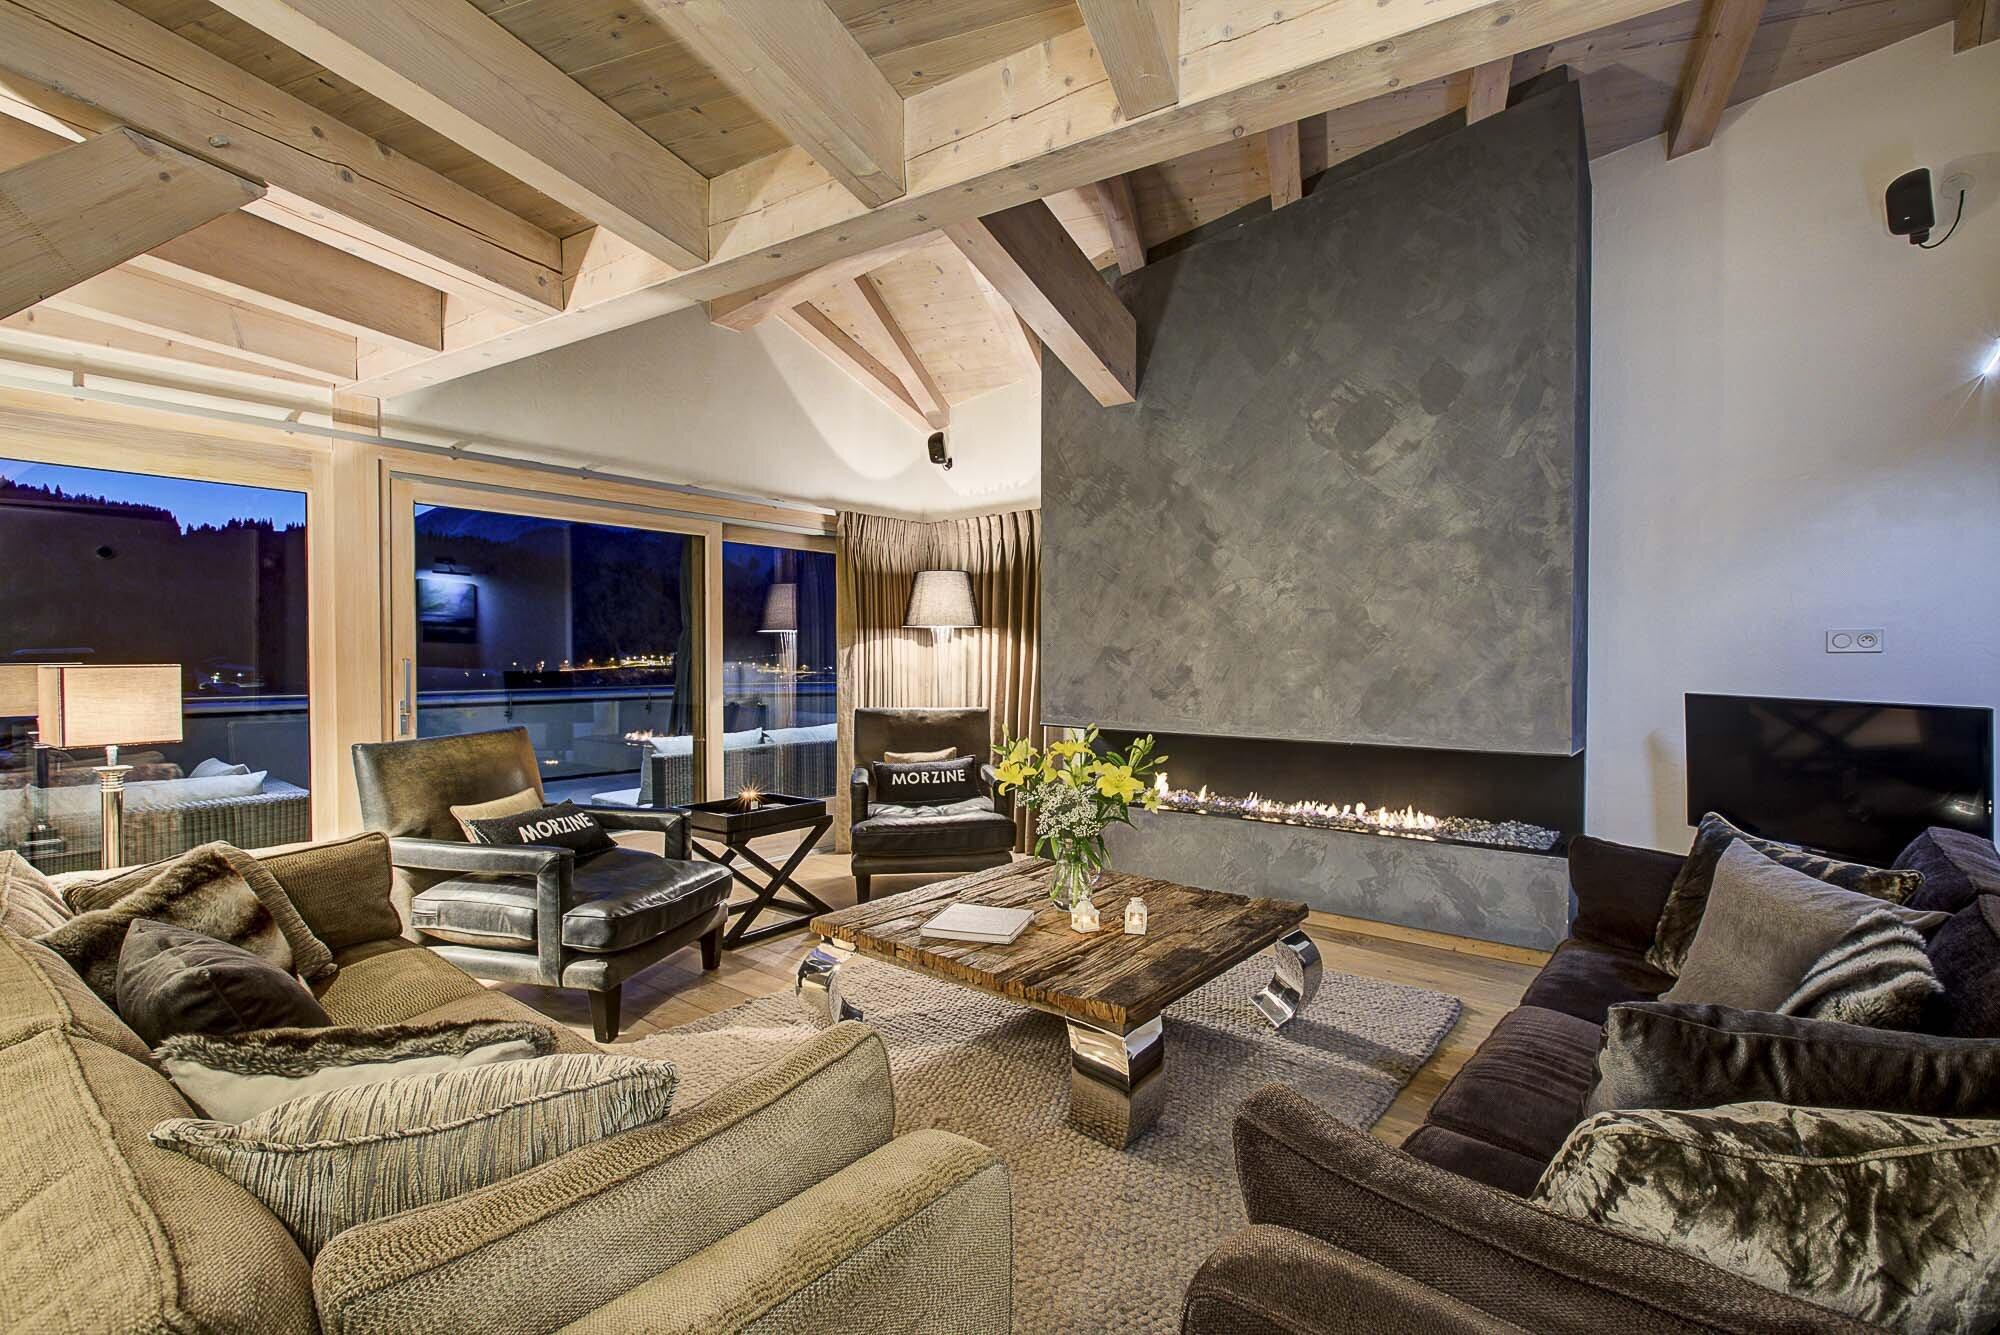 tg-ski-luxury-chalet-bouquetin-morzine-living-space-021.jpg